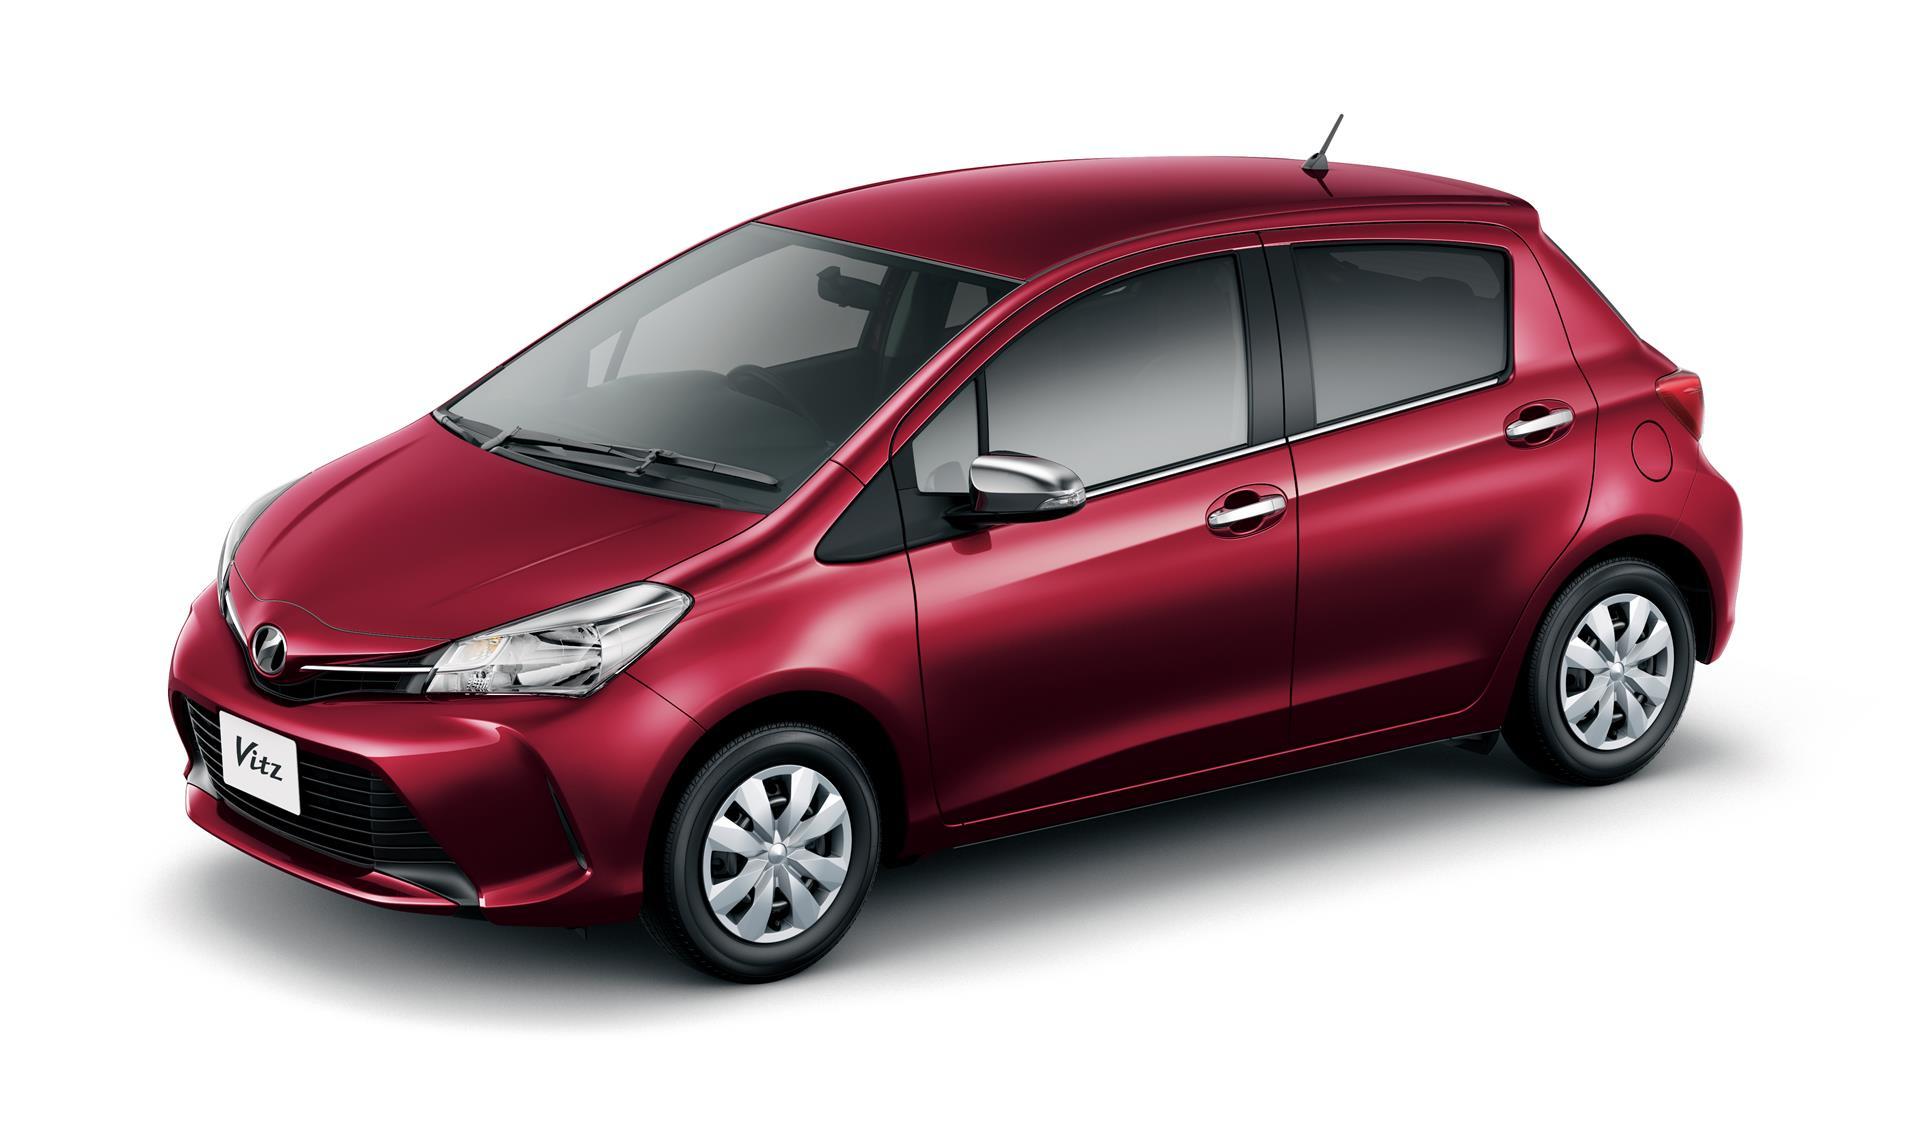 Toyota Yaris Vitz Gets Aygo Style Facelift Autoevolution